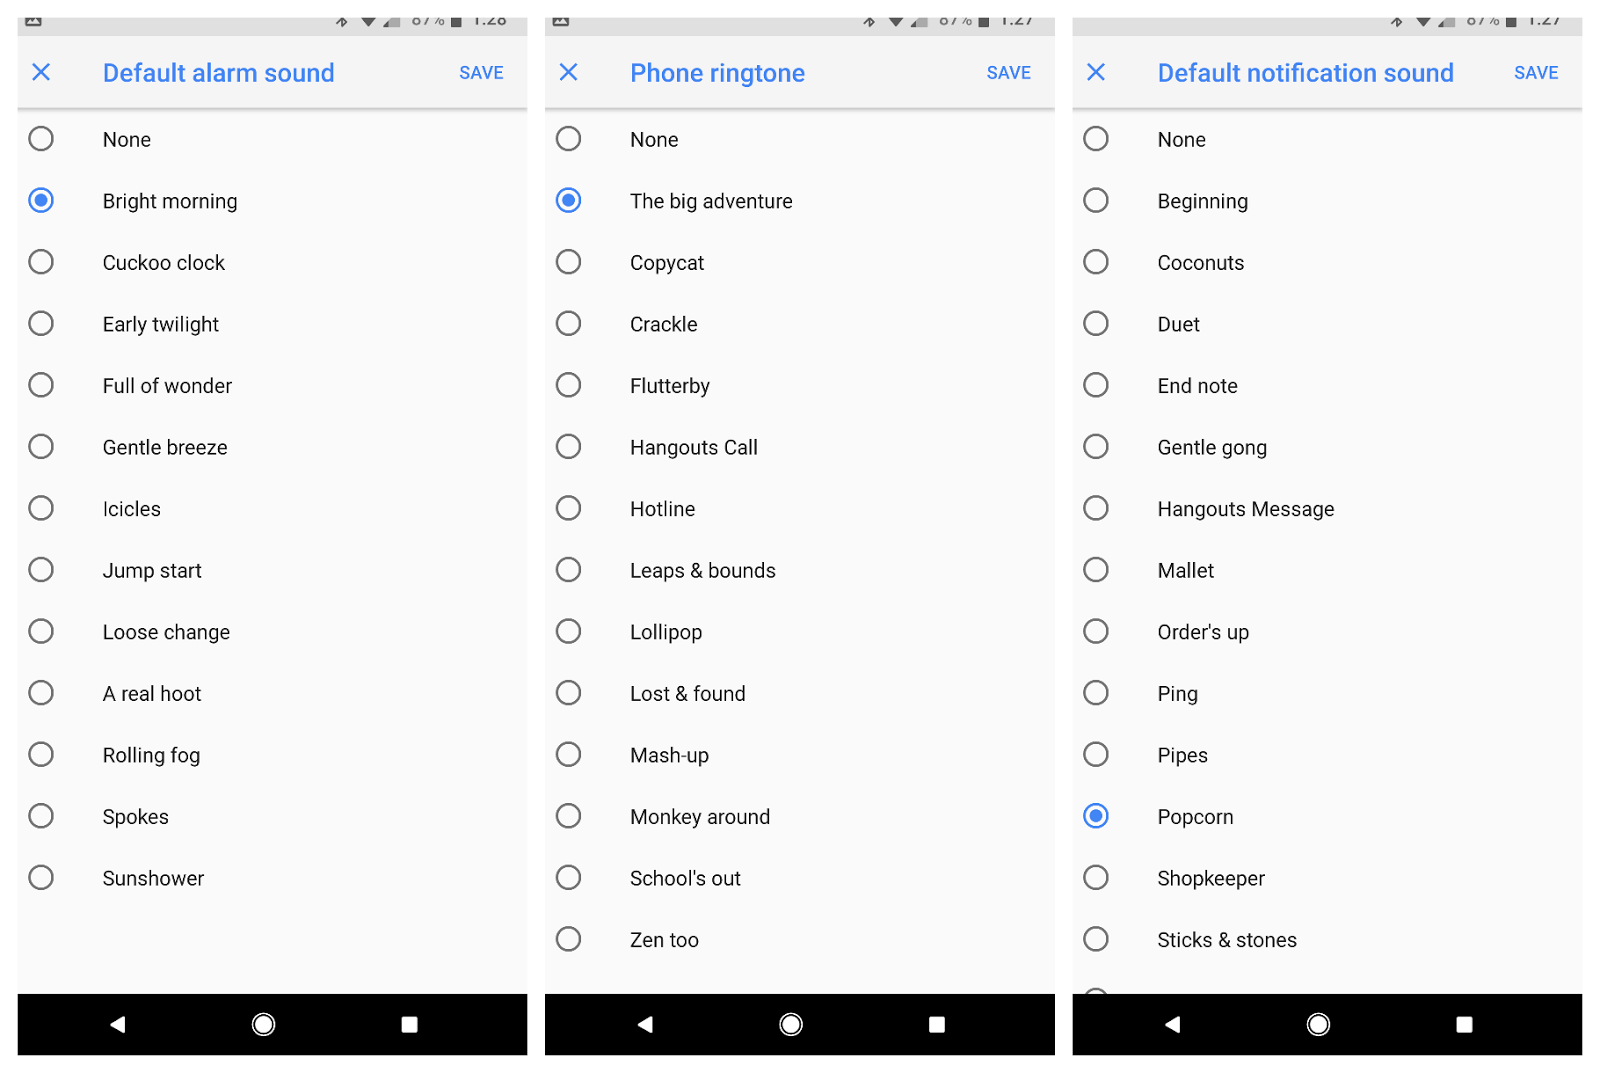 Download] Google Pixel 2 New Alarm Sounds, Notification Sounds